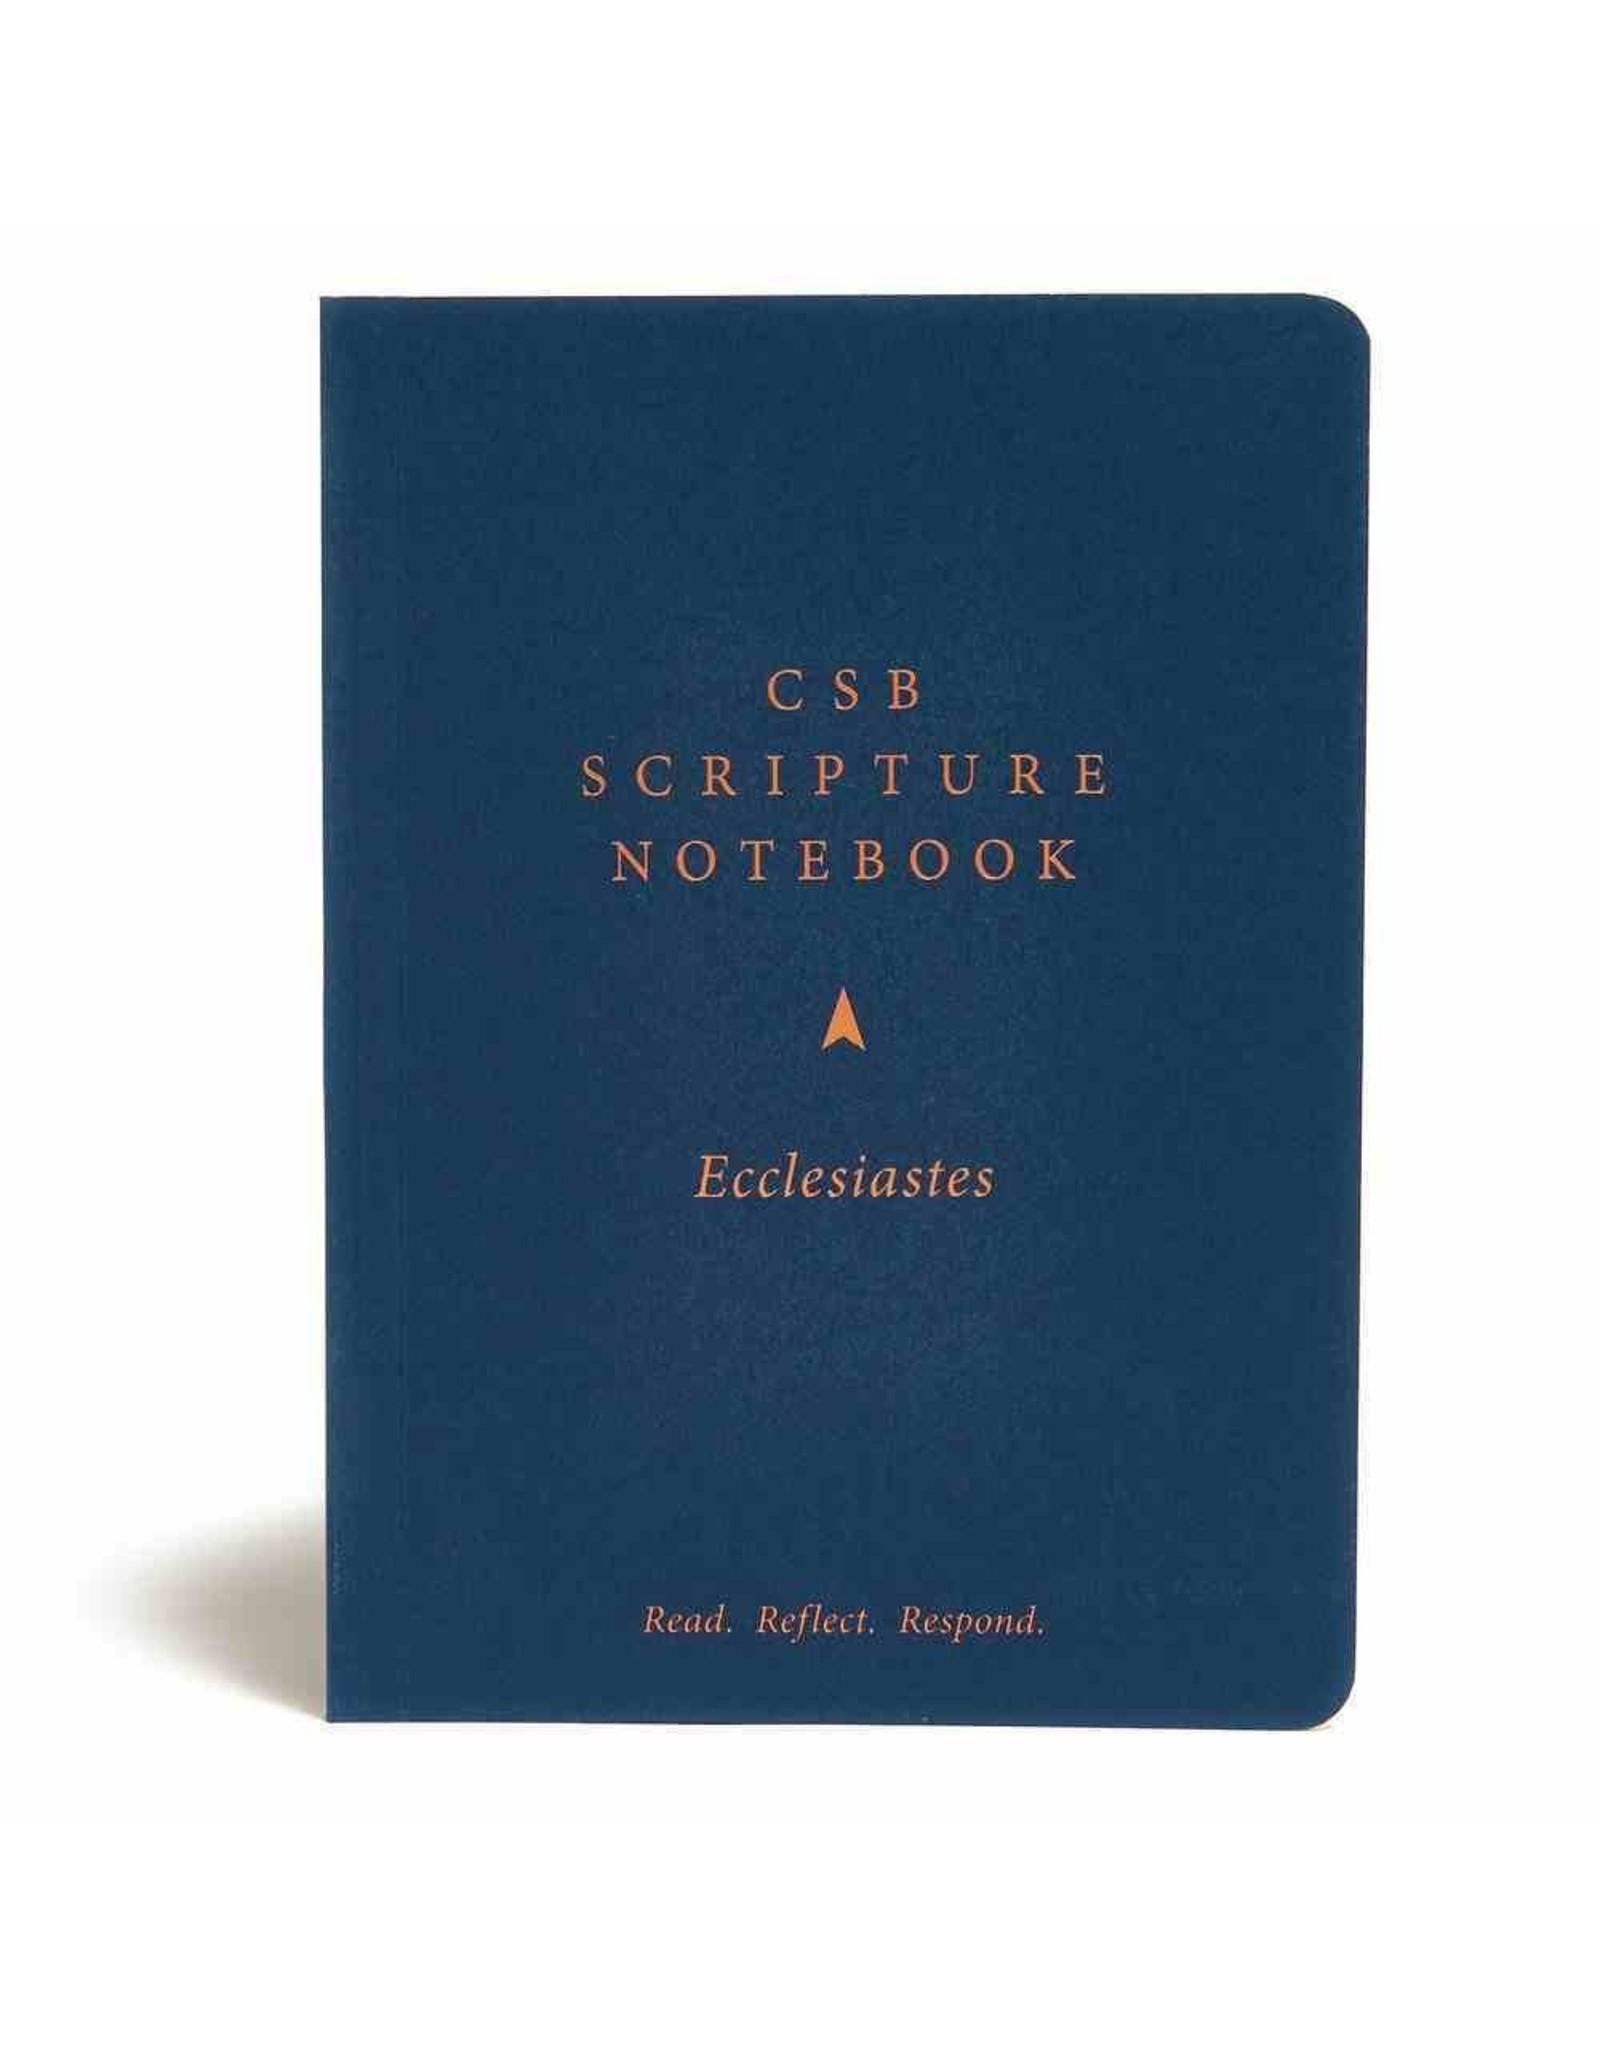 Holman CSB Scripture Notebook - Ecclesiastes